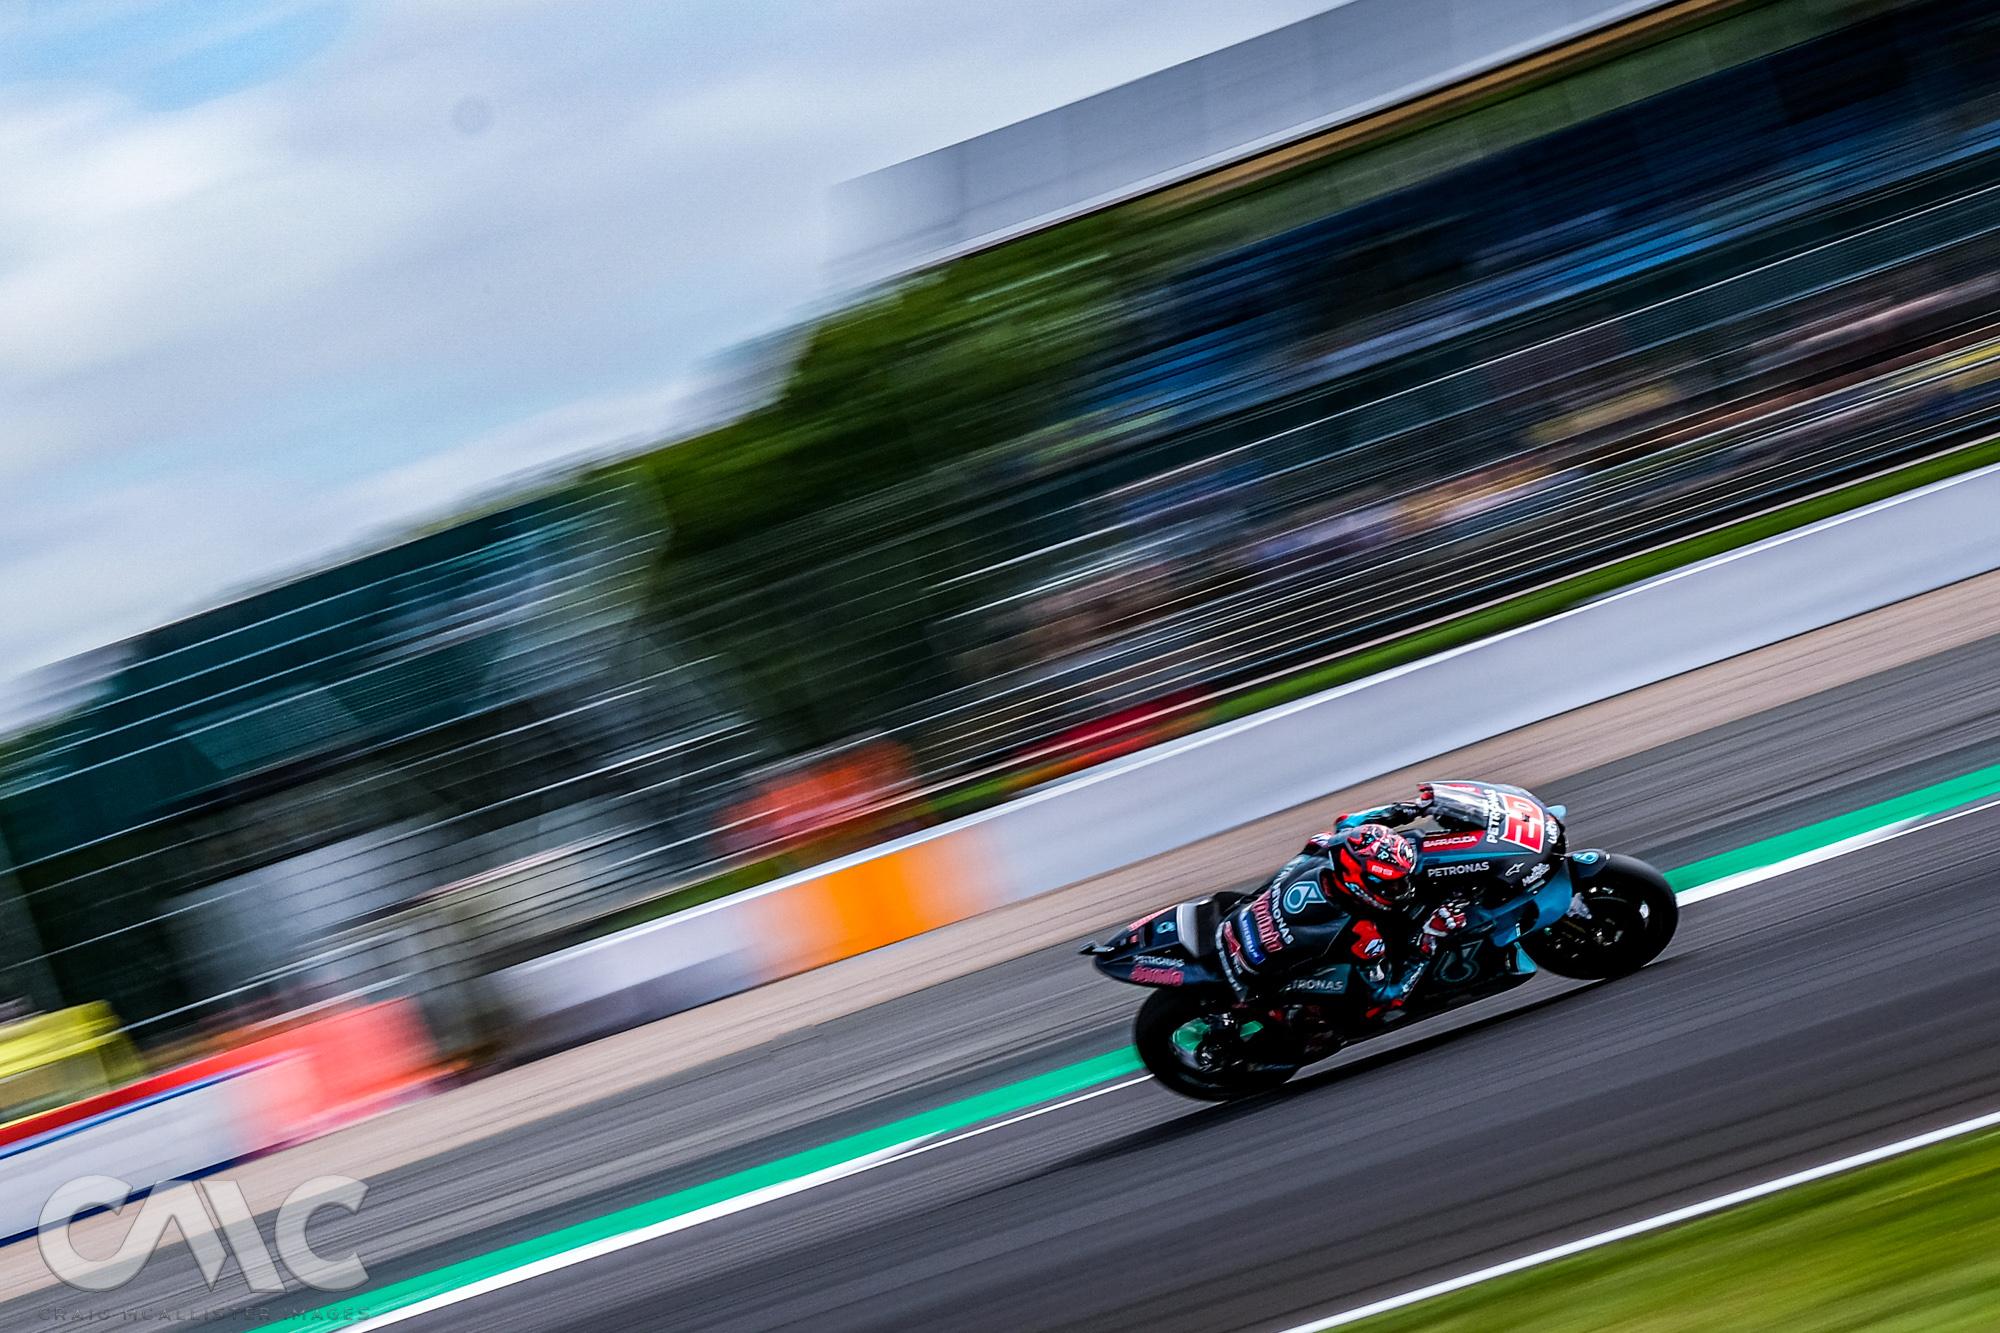 CMC_MotoGP_FP1_Silverstone 50-140445.jpg